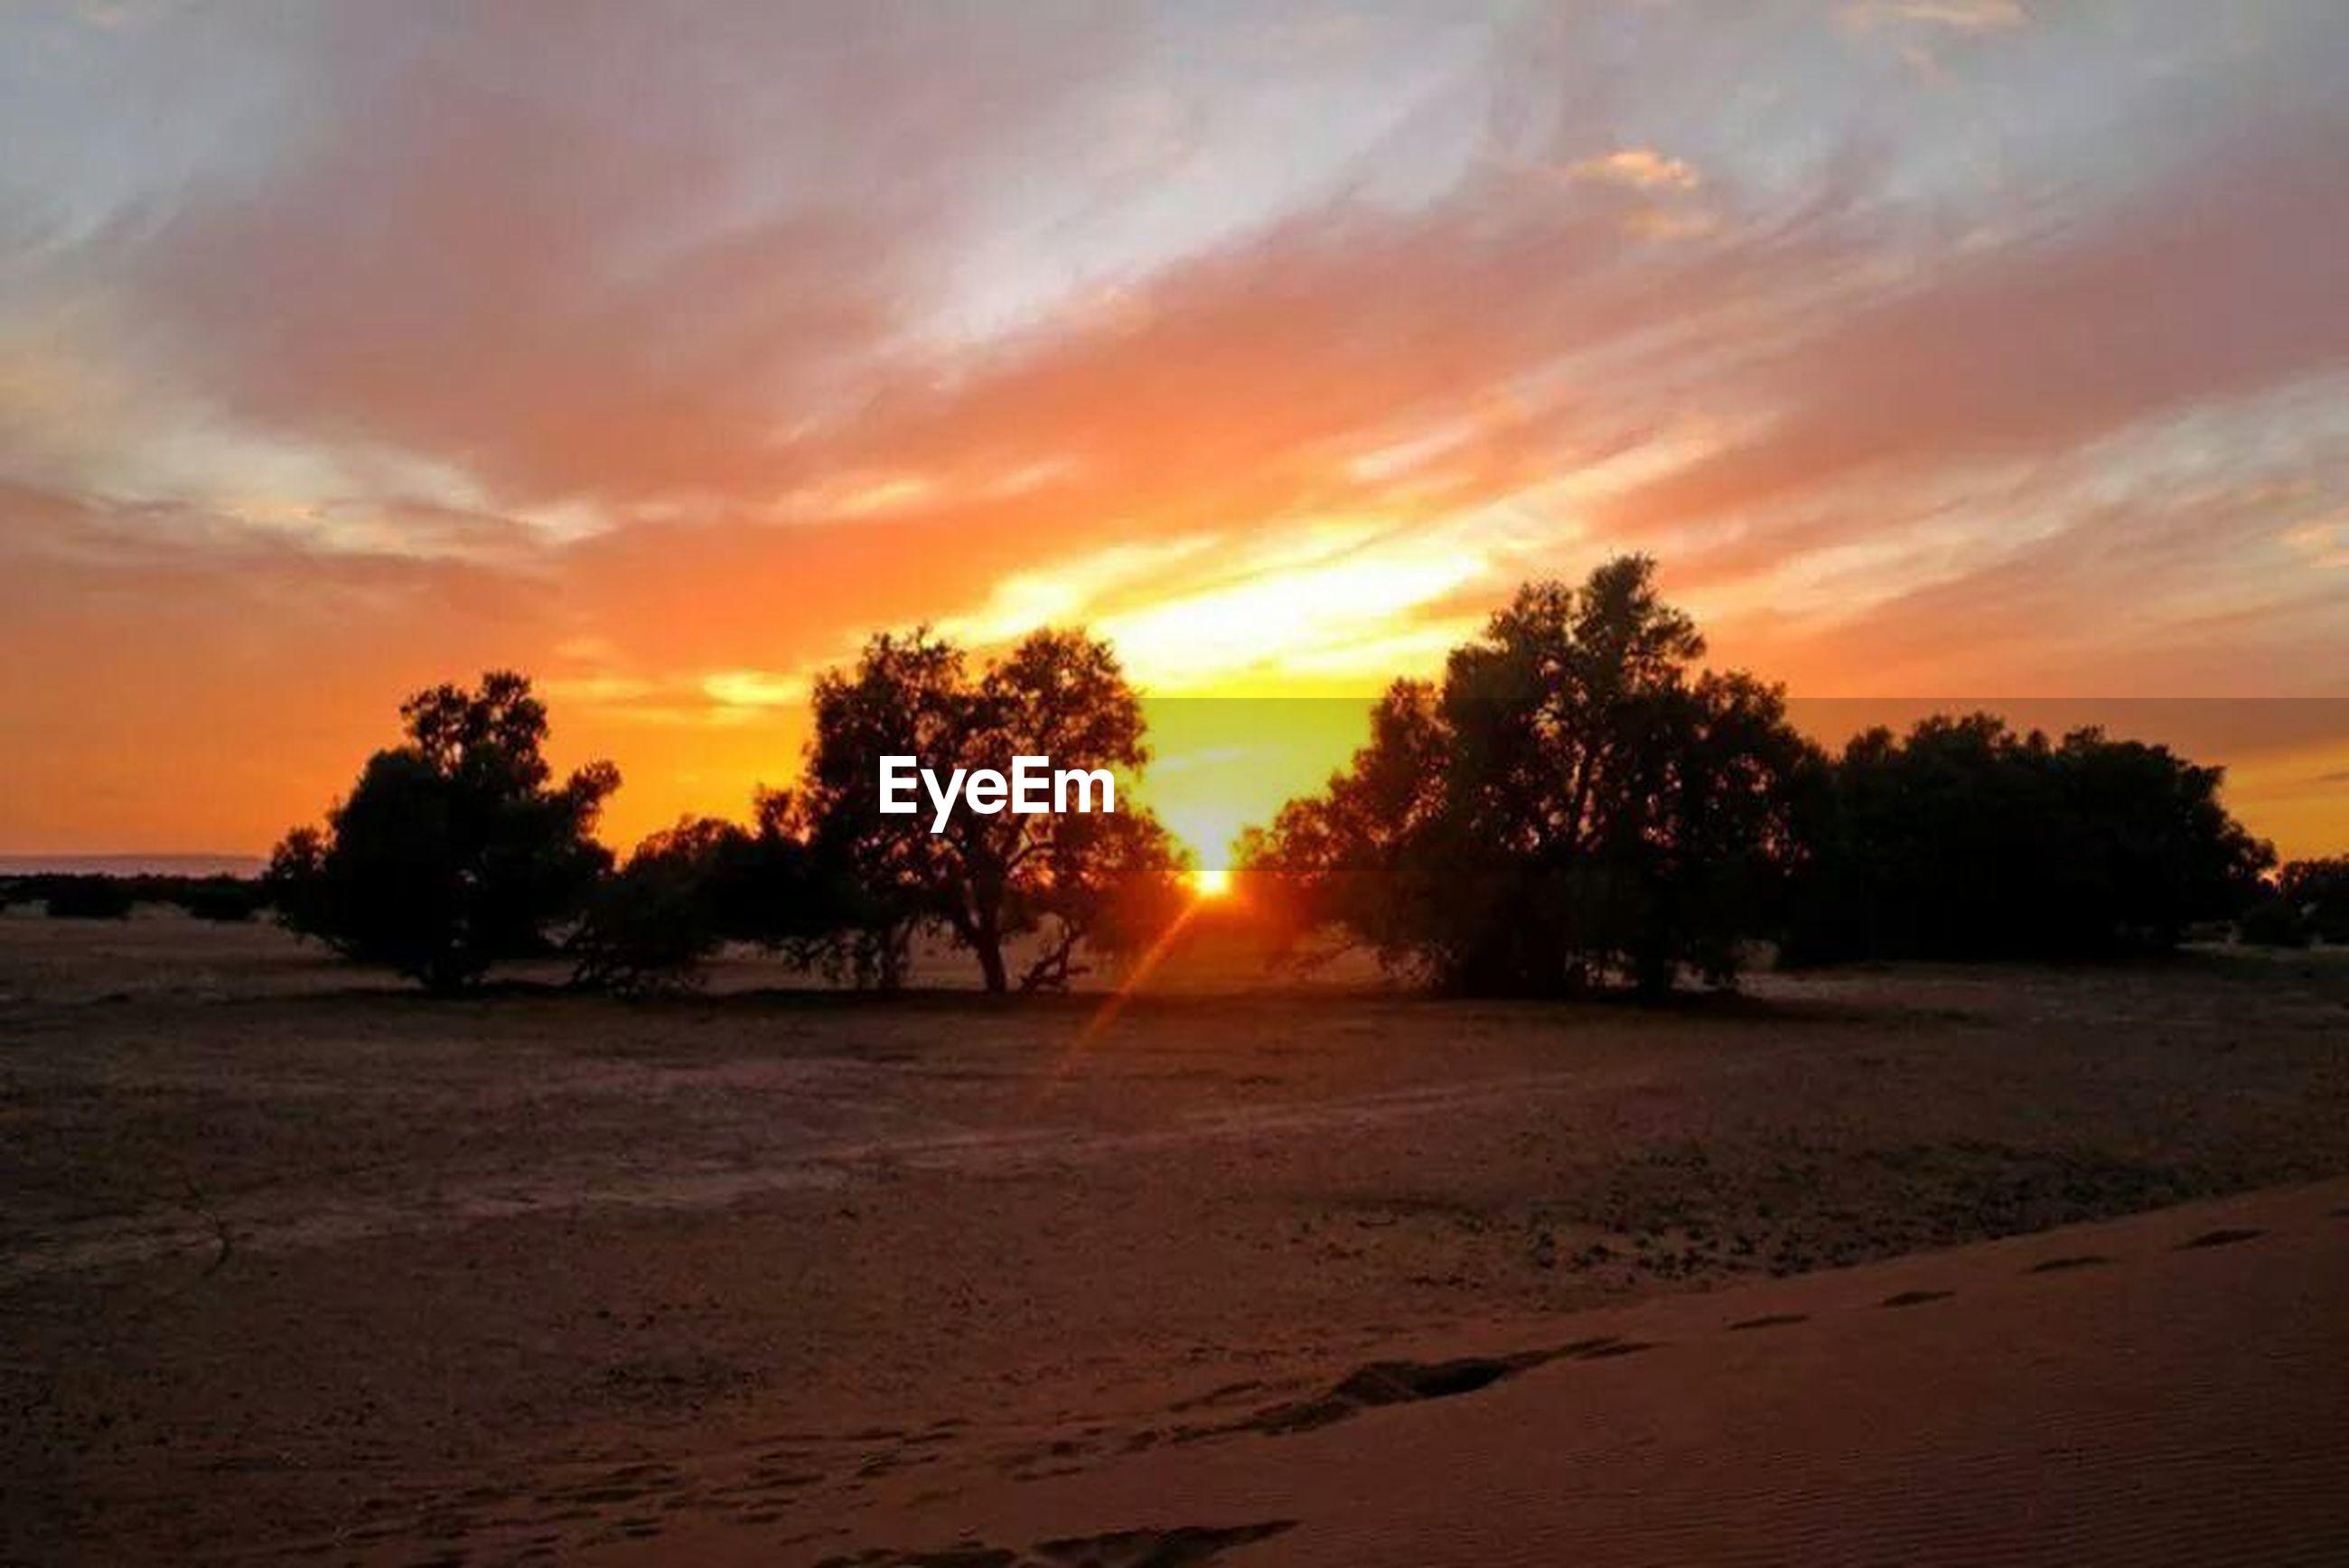 sunset, orange color, tranquil scene, scenics, tranquility, beauty in nature, sky, tree, beach, silhouette, sand, nature, idyllic, sun, cloud - sky, landscape, shore, non-urban scene, sunlight, outdoors